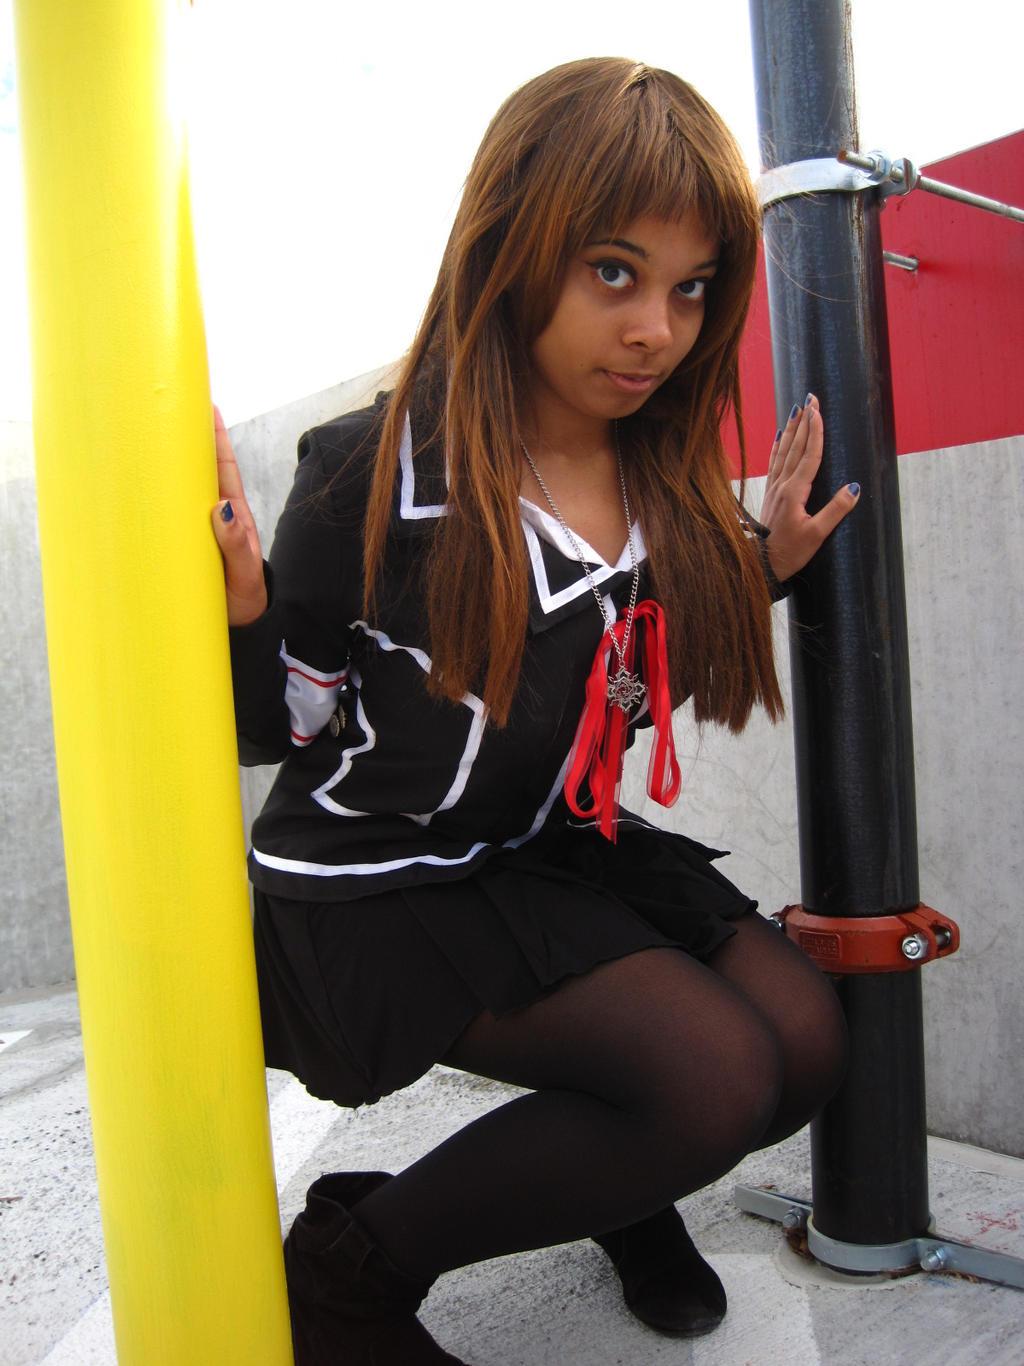 Yuki Cross Vampire Knight Cosplay by PlutoAsABoy on DeviantArt